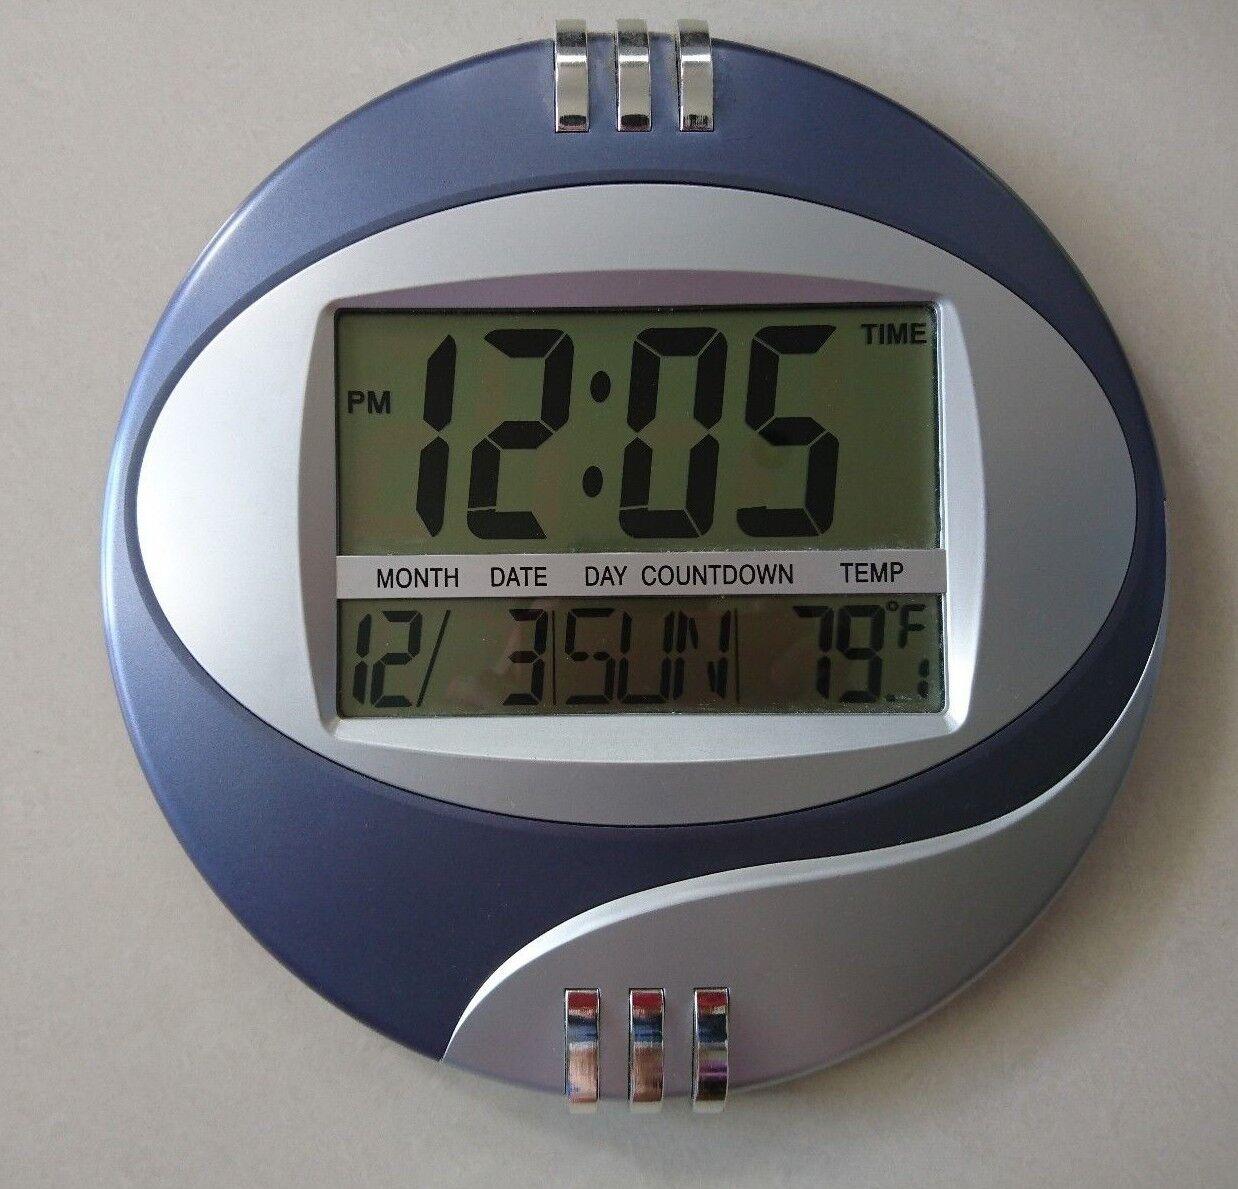 large 5.5cm time display 10''/27cm Round Digital Clock, Alarm, Temp, Calendar.